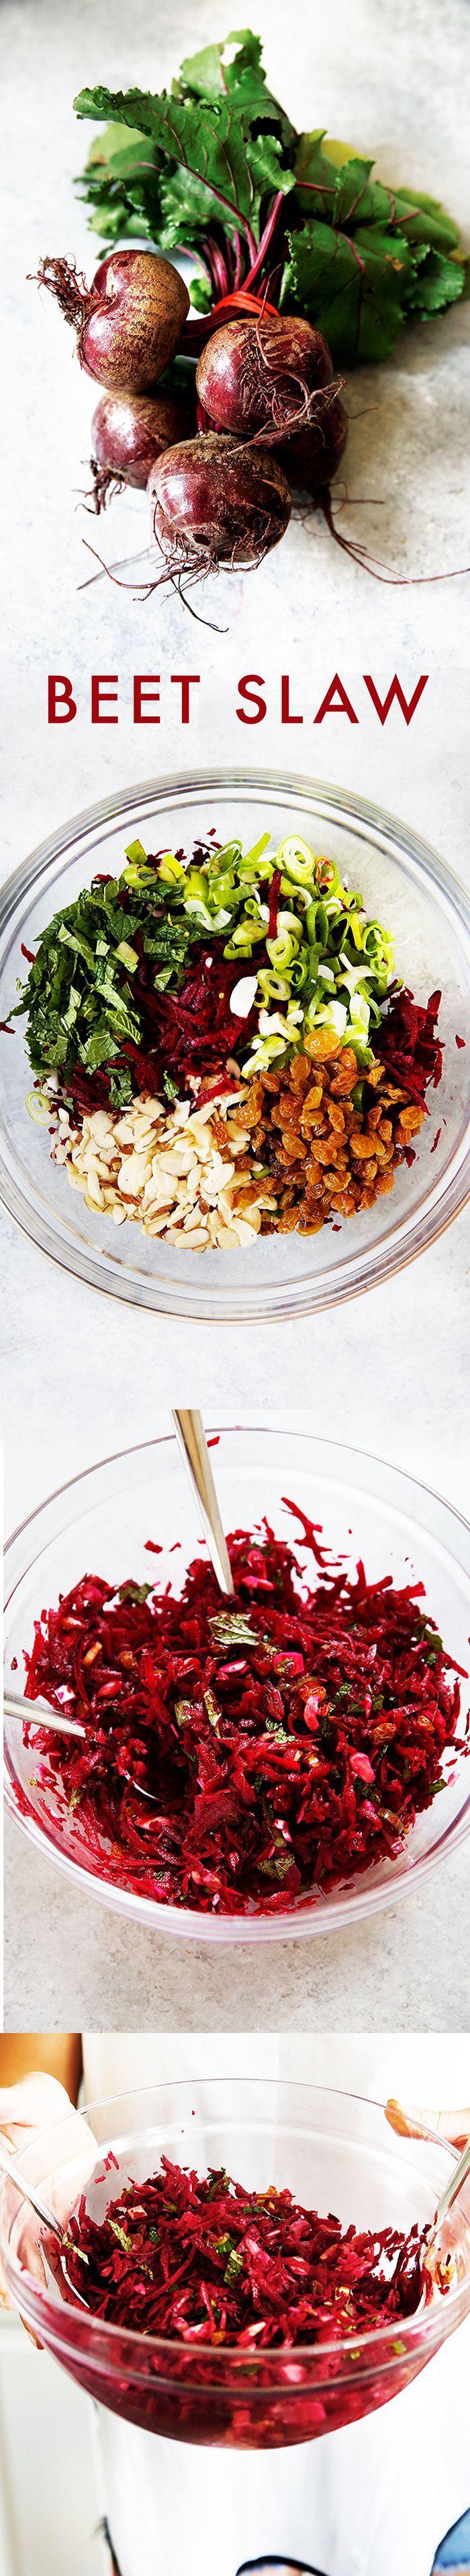 Healthy Beet Slaw - Lexi's Clean Kitchen